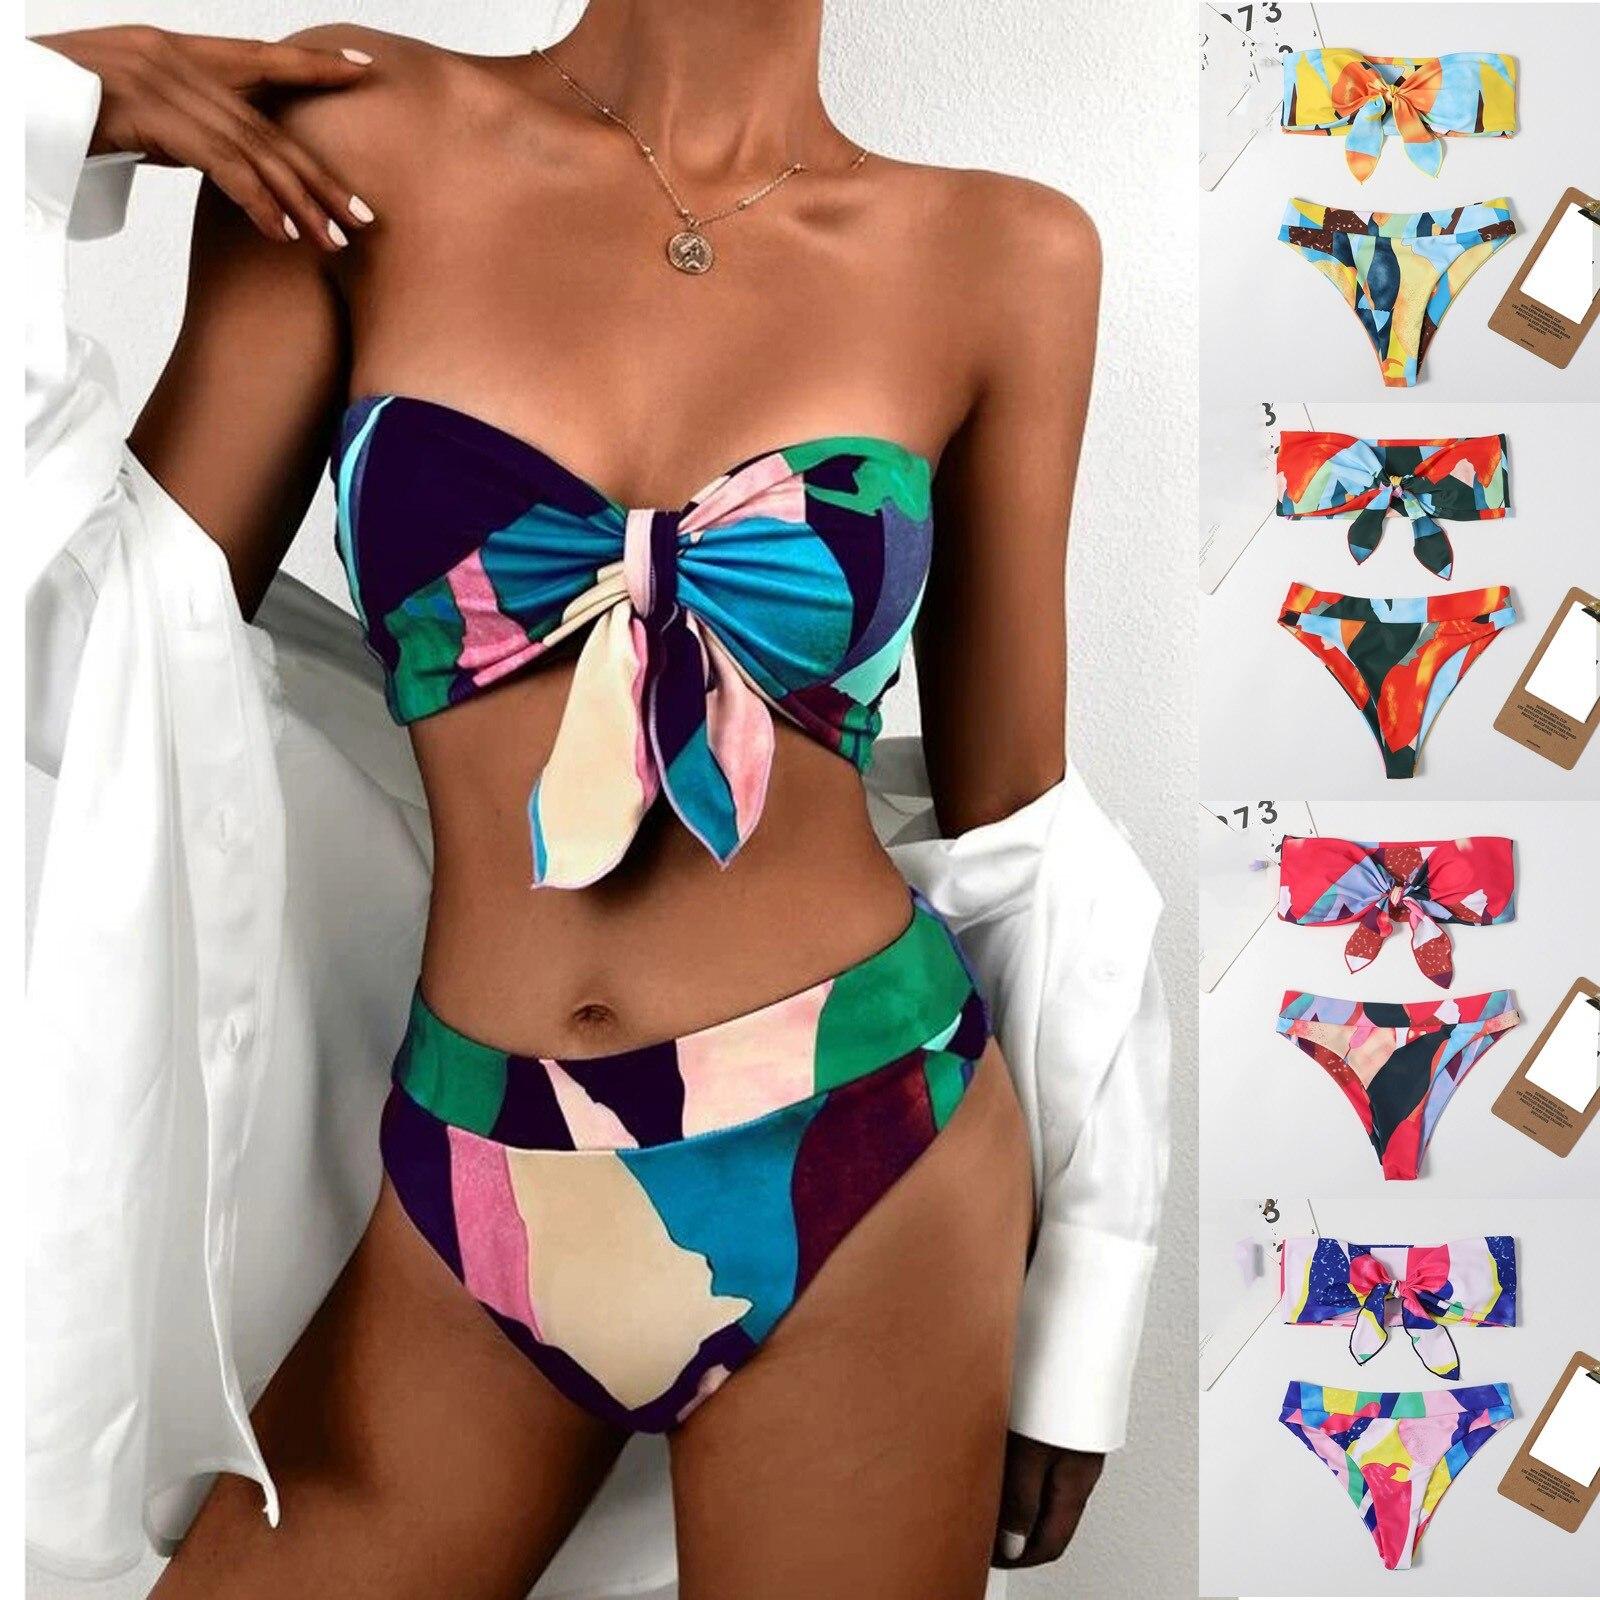 Bikini couleur imprimé avec caleçon